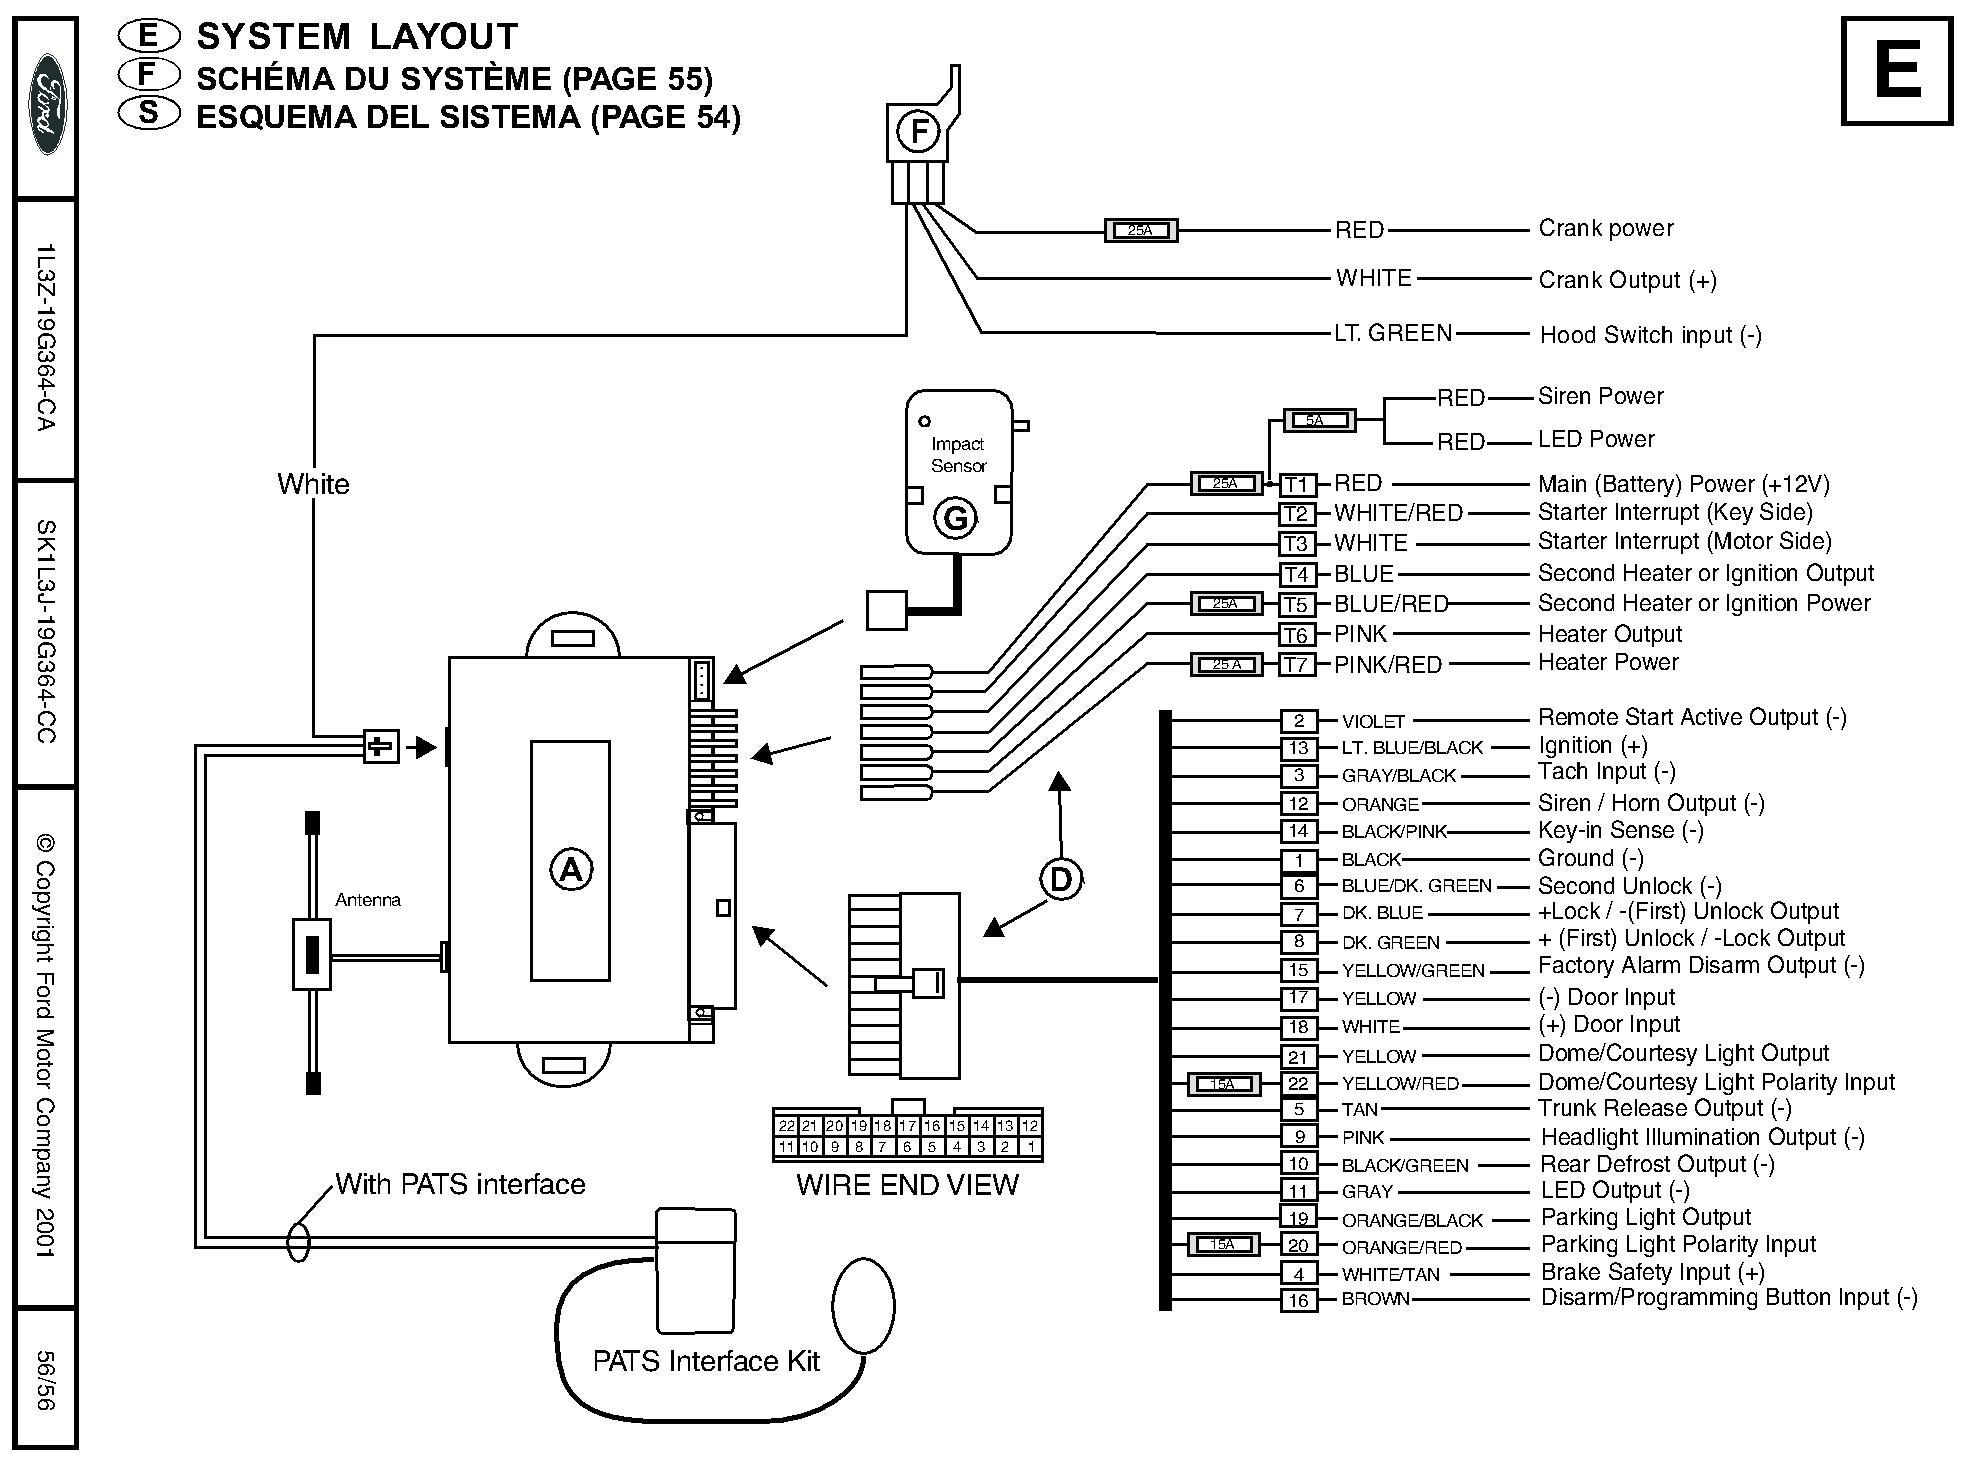 fordgoldstarter?resize=665%2C494 wiring diagram 2005 ford escape the wiring diagram readingrat net 2002 Ford Escape Repair Guide at bakdesigns.co